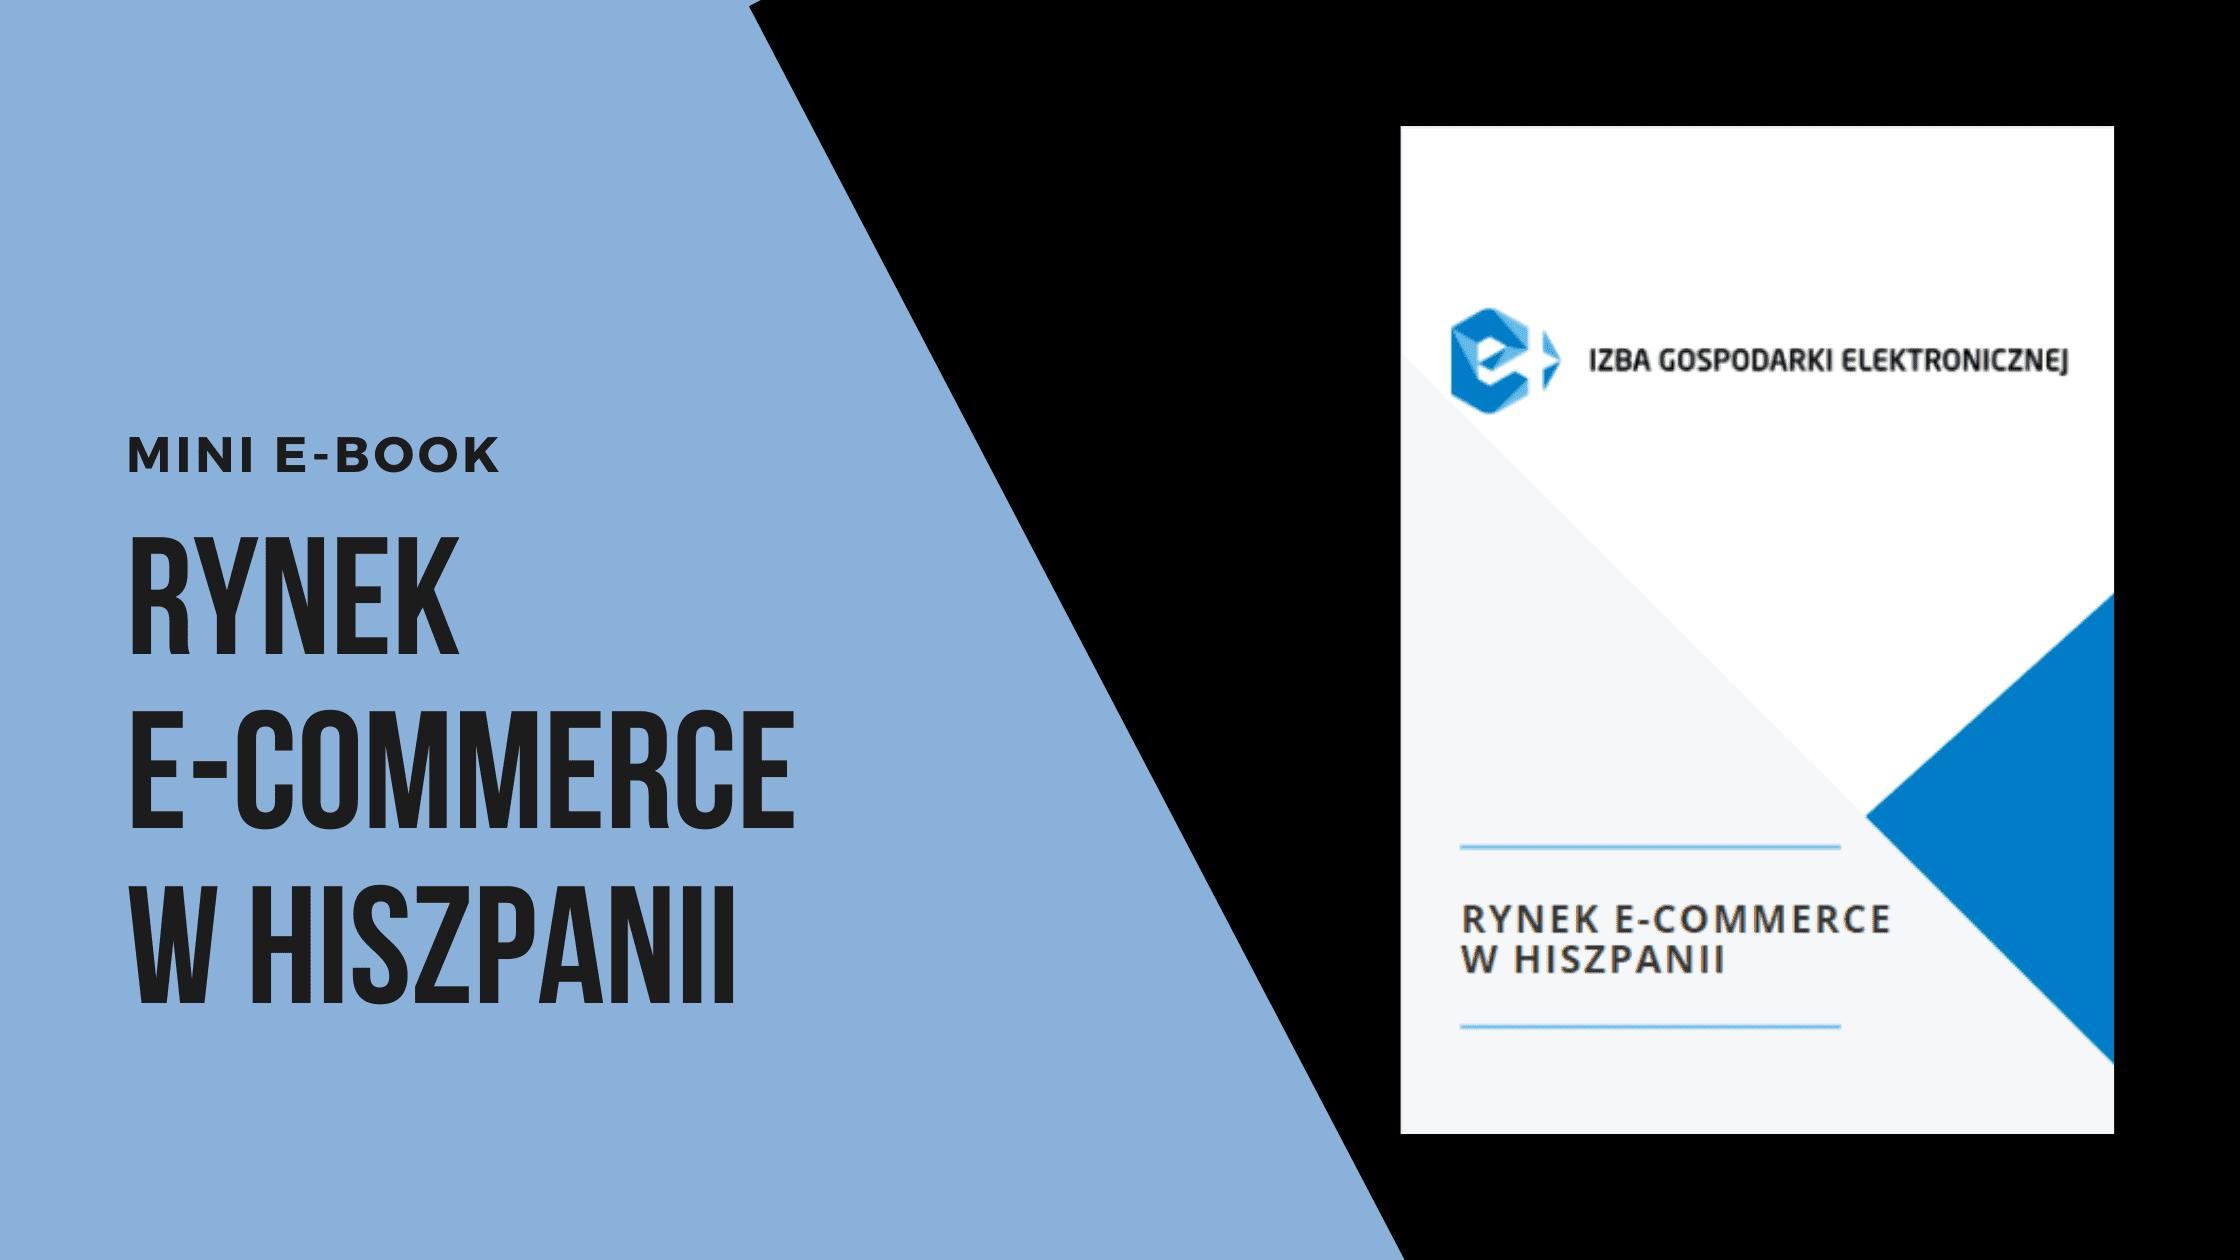 Rynek e-commerce w Hiszpanii